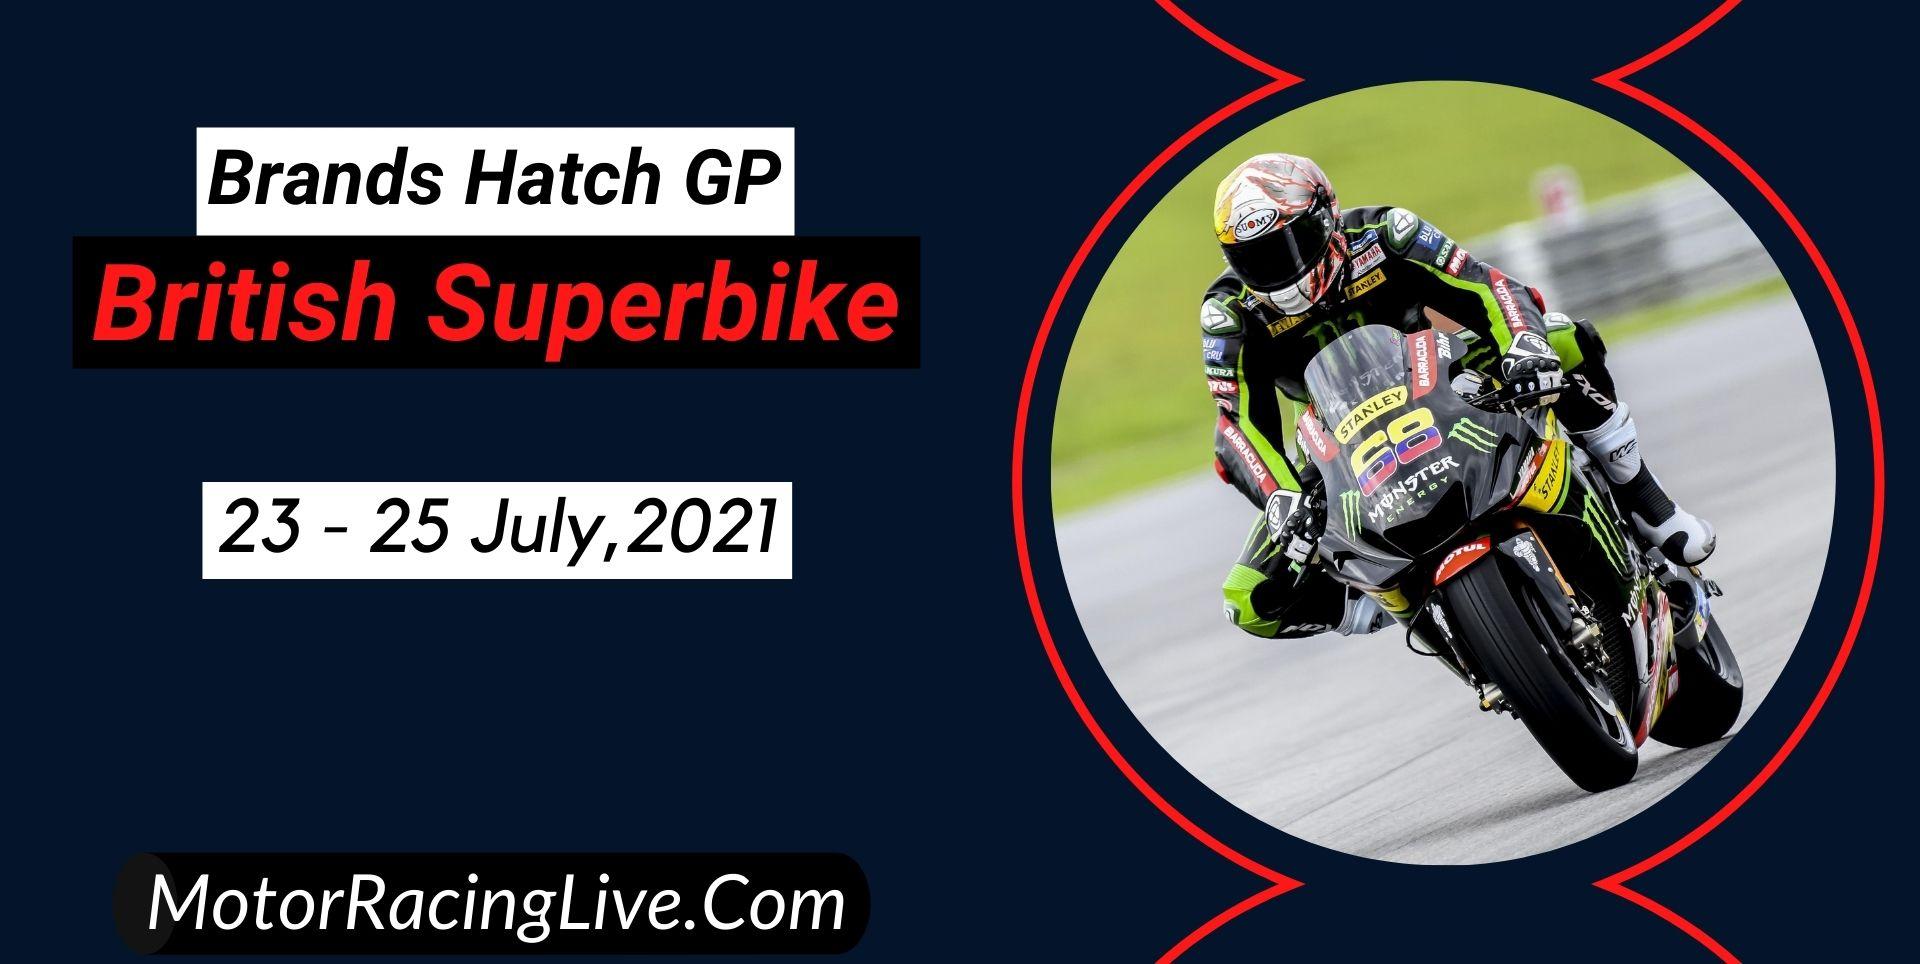 Brands Hatch GP Live Stream 2021   British Superbike